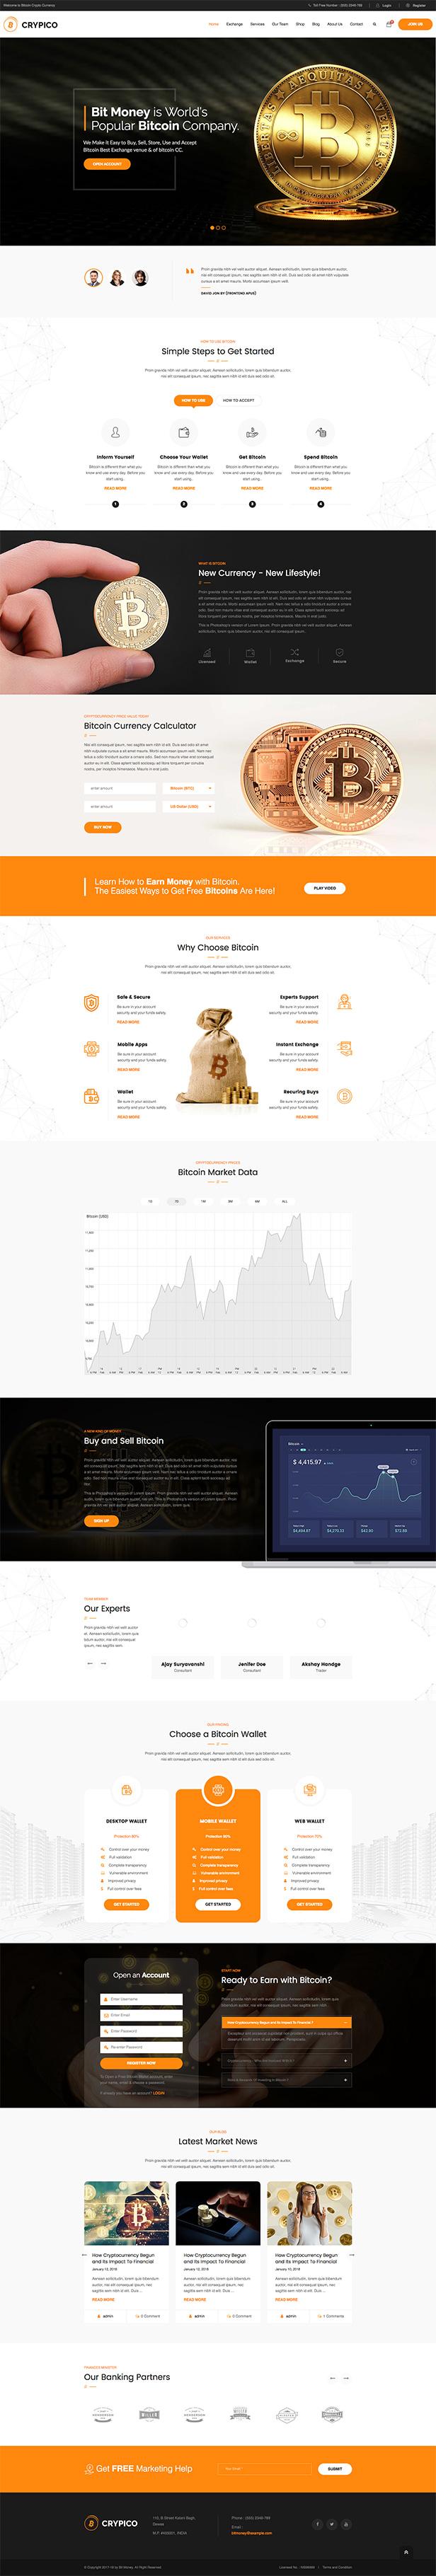 Crypico - Crypto Currency WordPress Theme 1